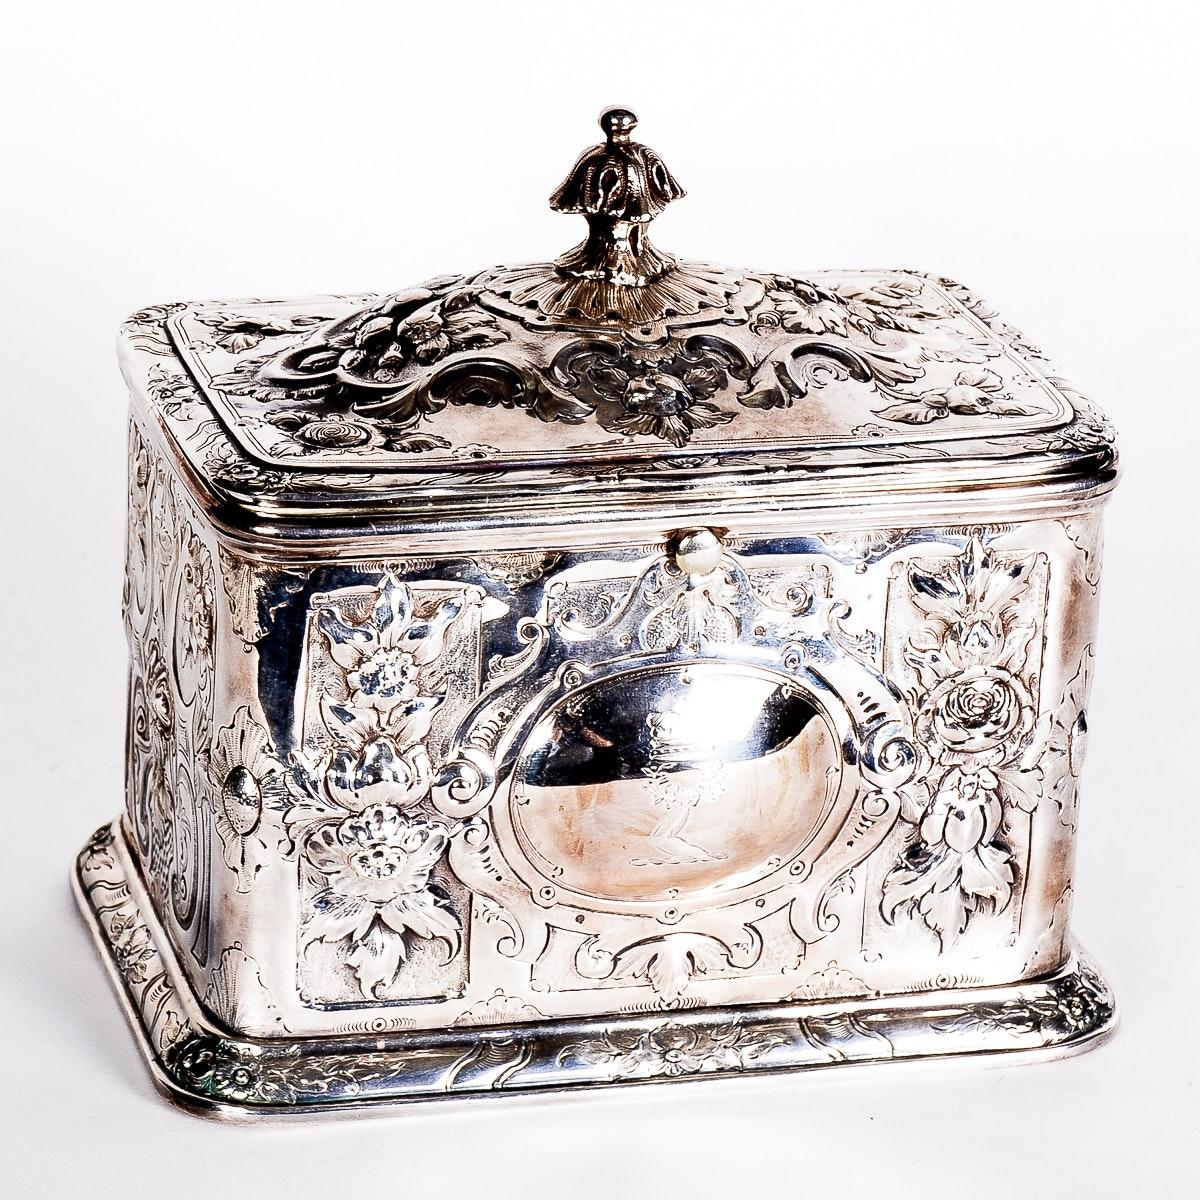 Antique English Silver Plate Repousse Trinket Box